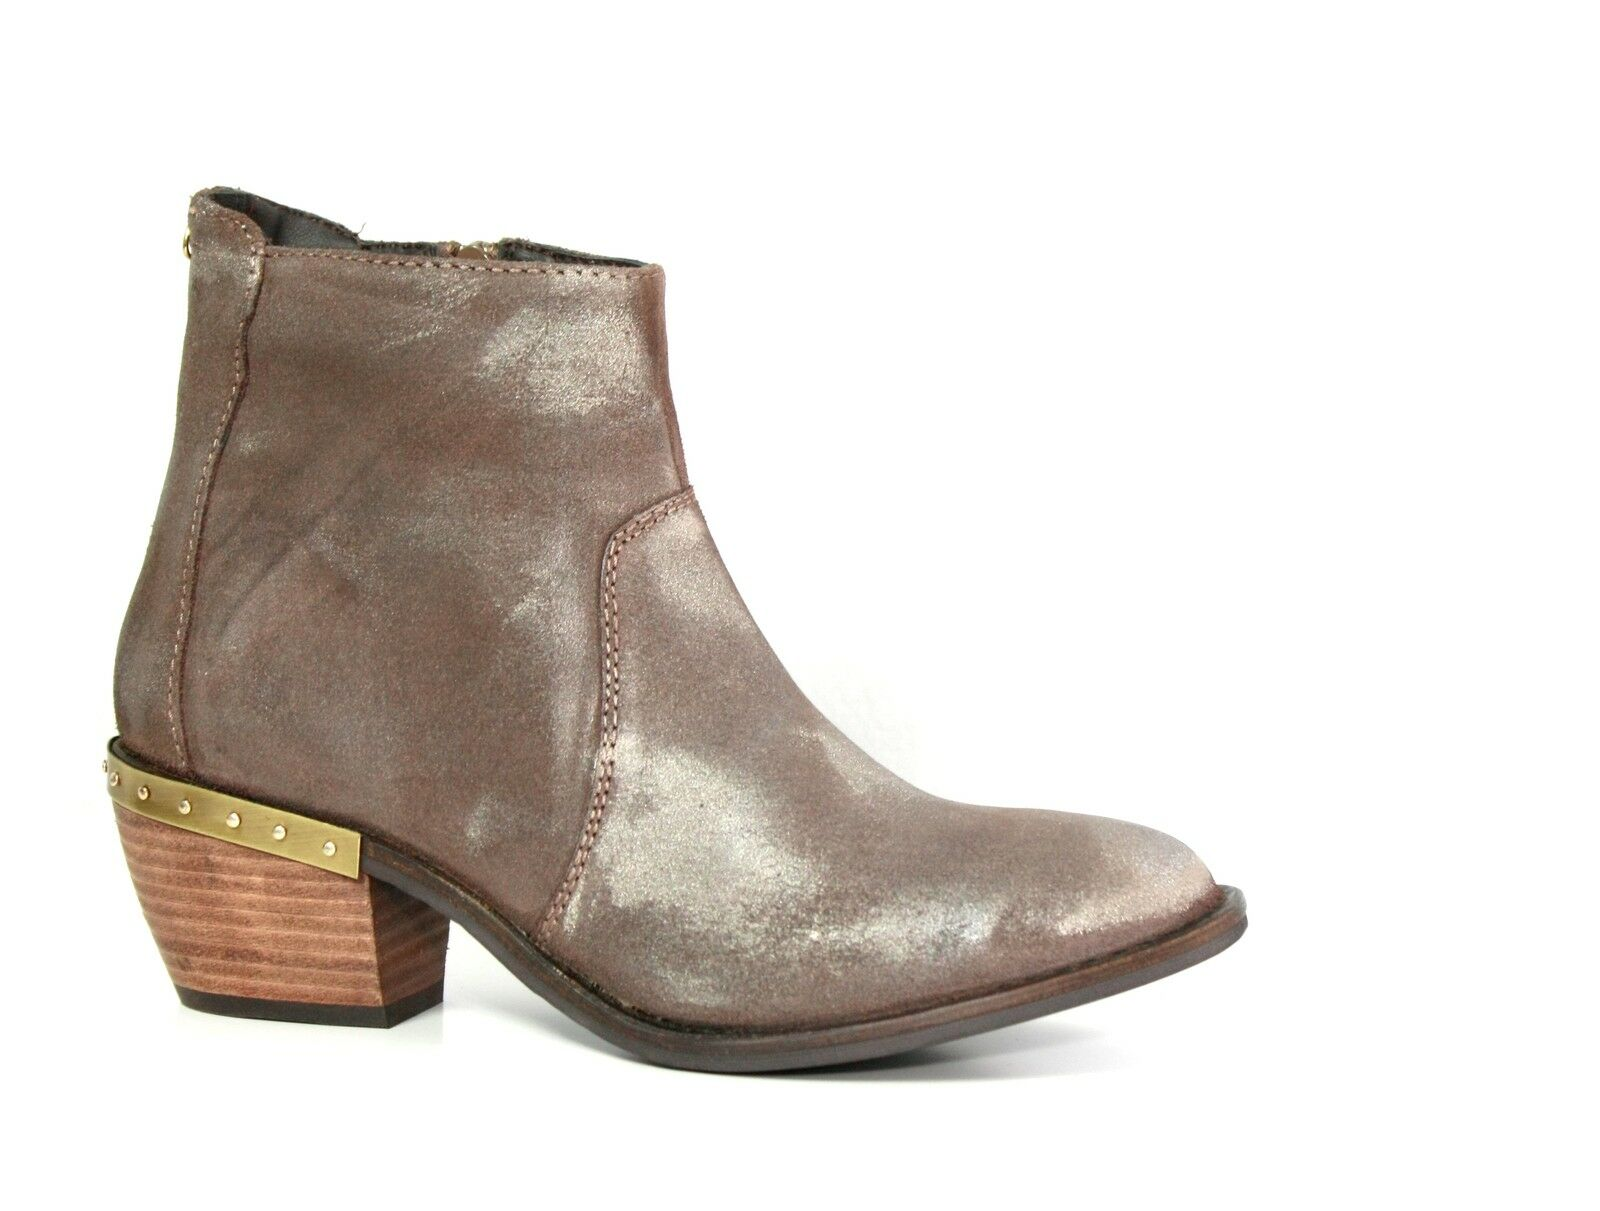 SPM Shoes Burgos Damen Bnkle Western Stiefelette Schuhe  Gr. 37 38 39 40 41